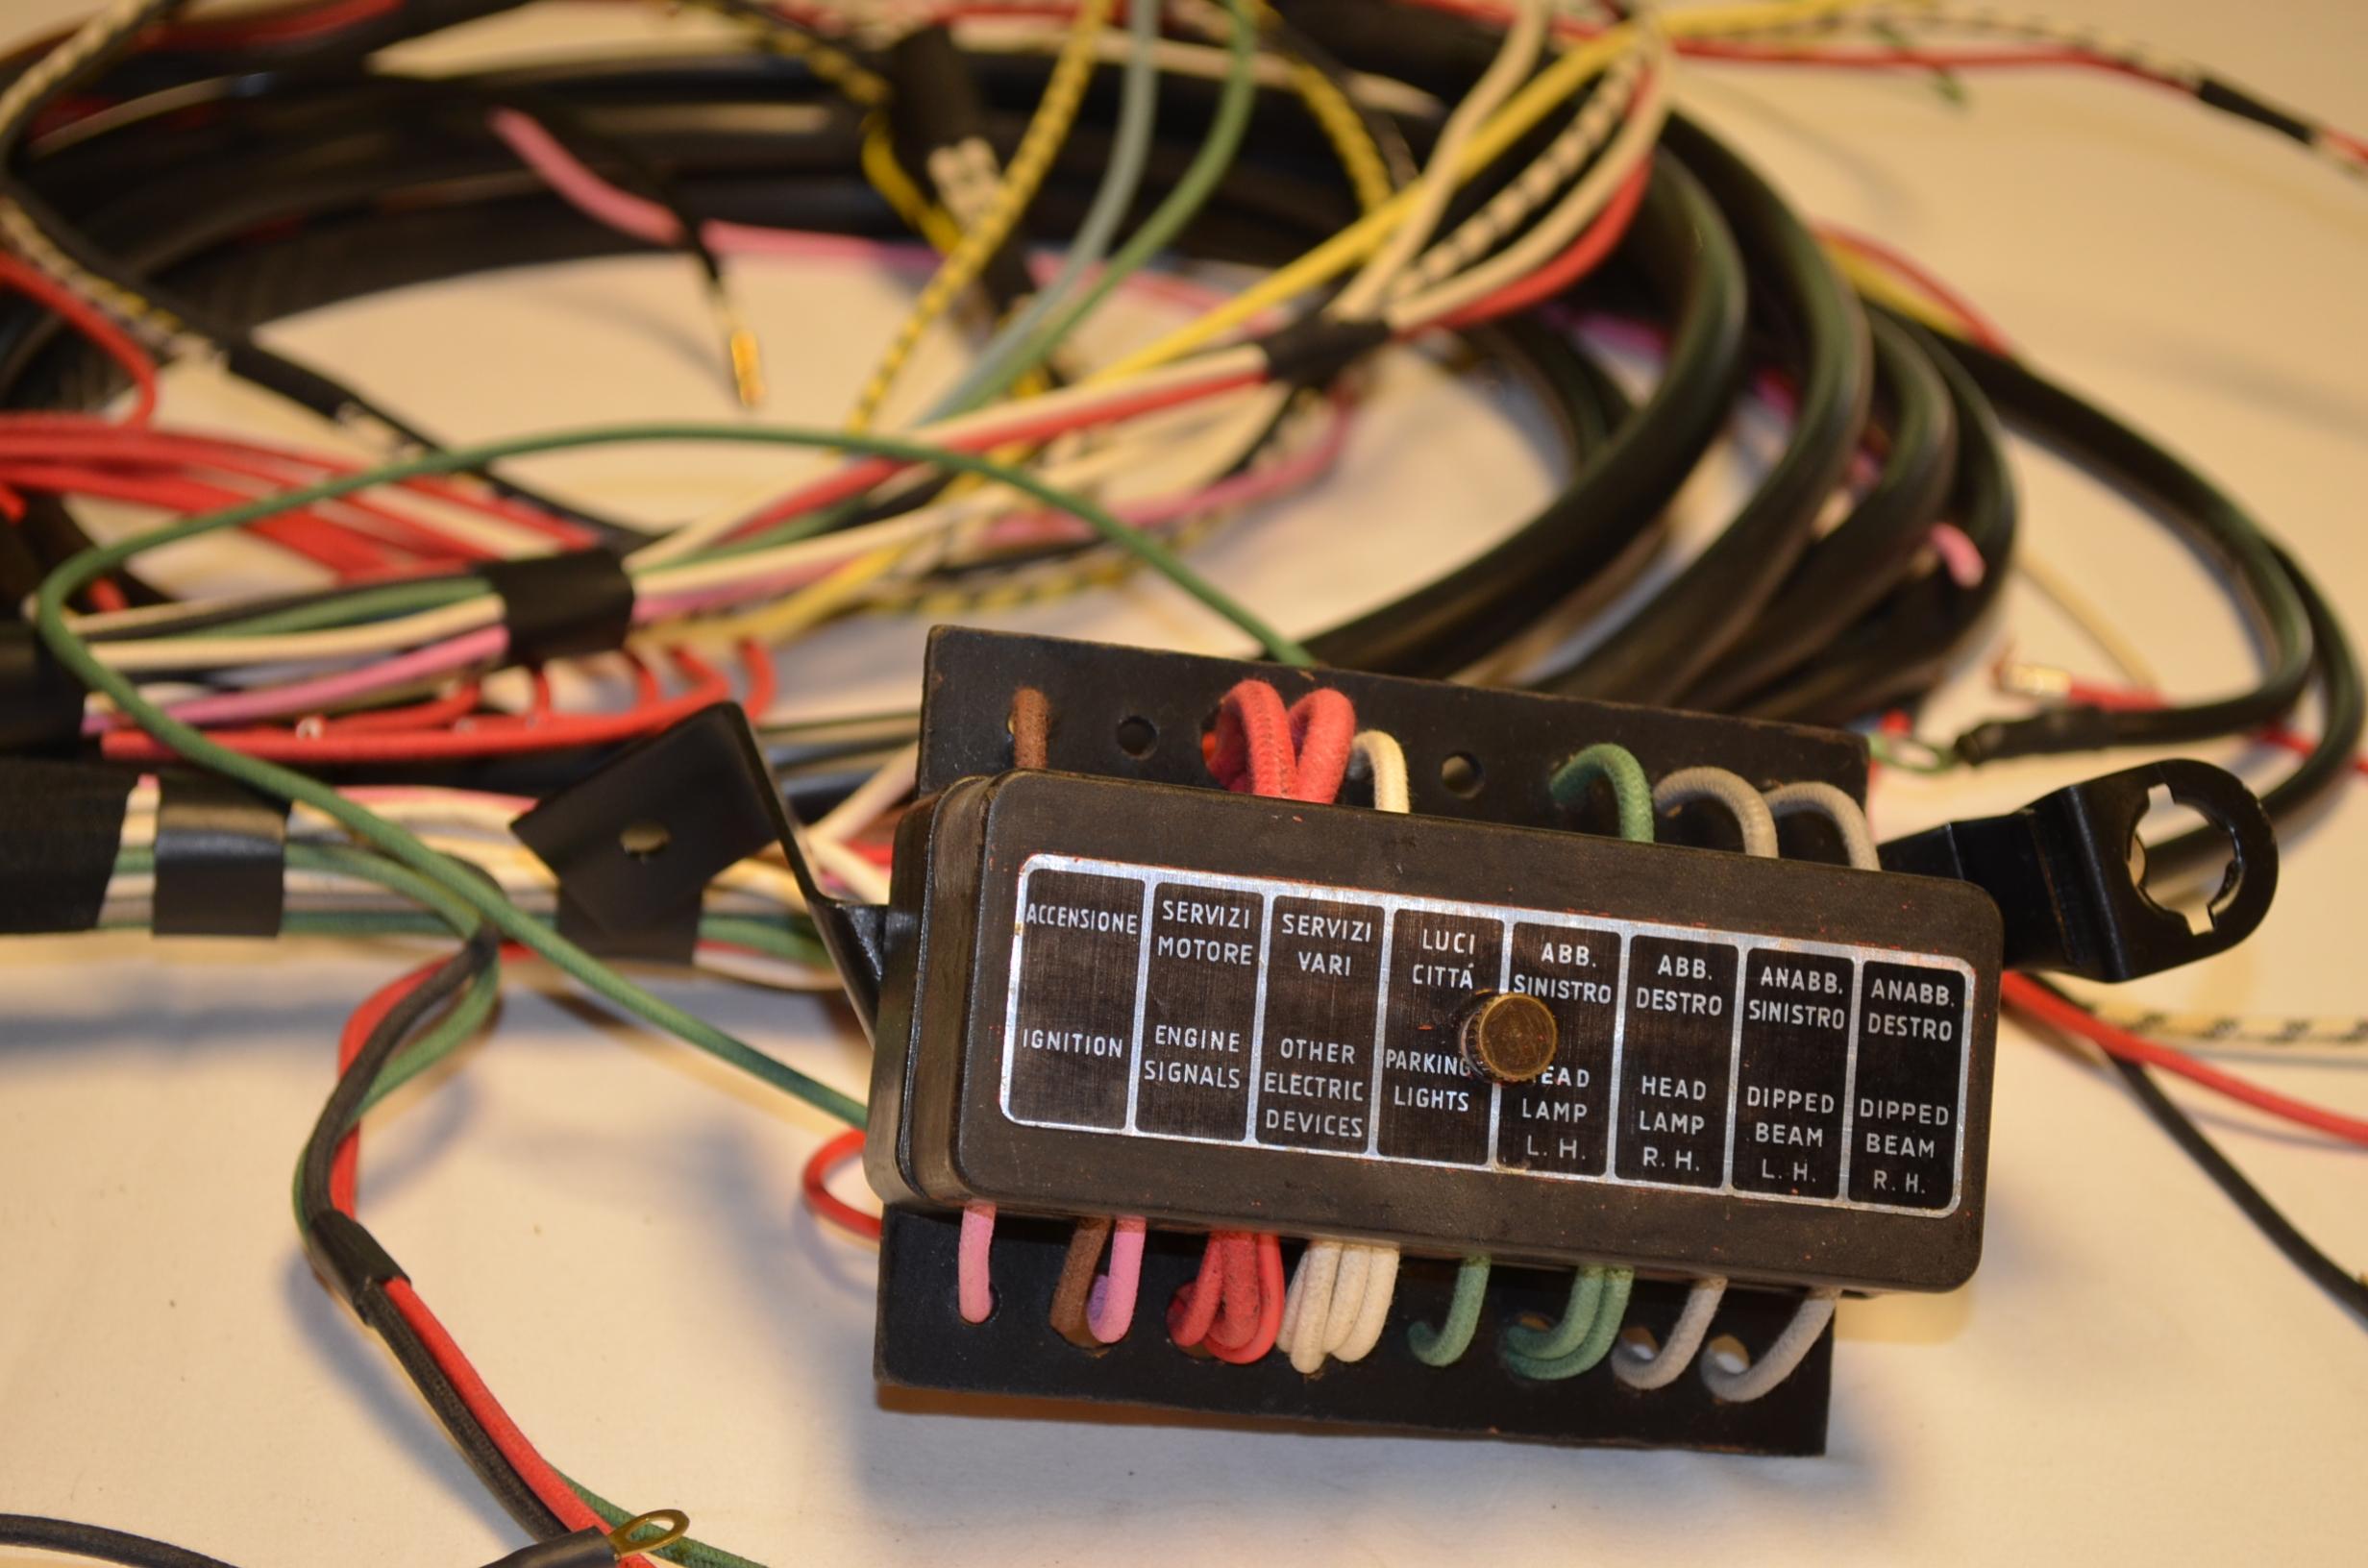 DSC_0031?fit=1200%2C795 wiring looms auto italia sportiva alfa giulietta wiring diagram at beritabola.co